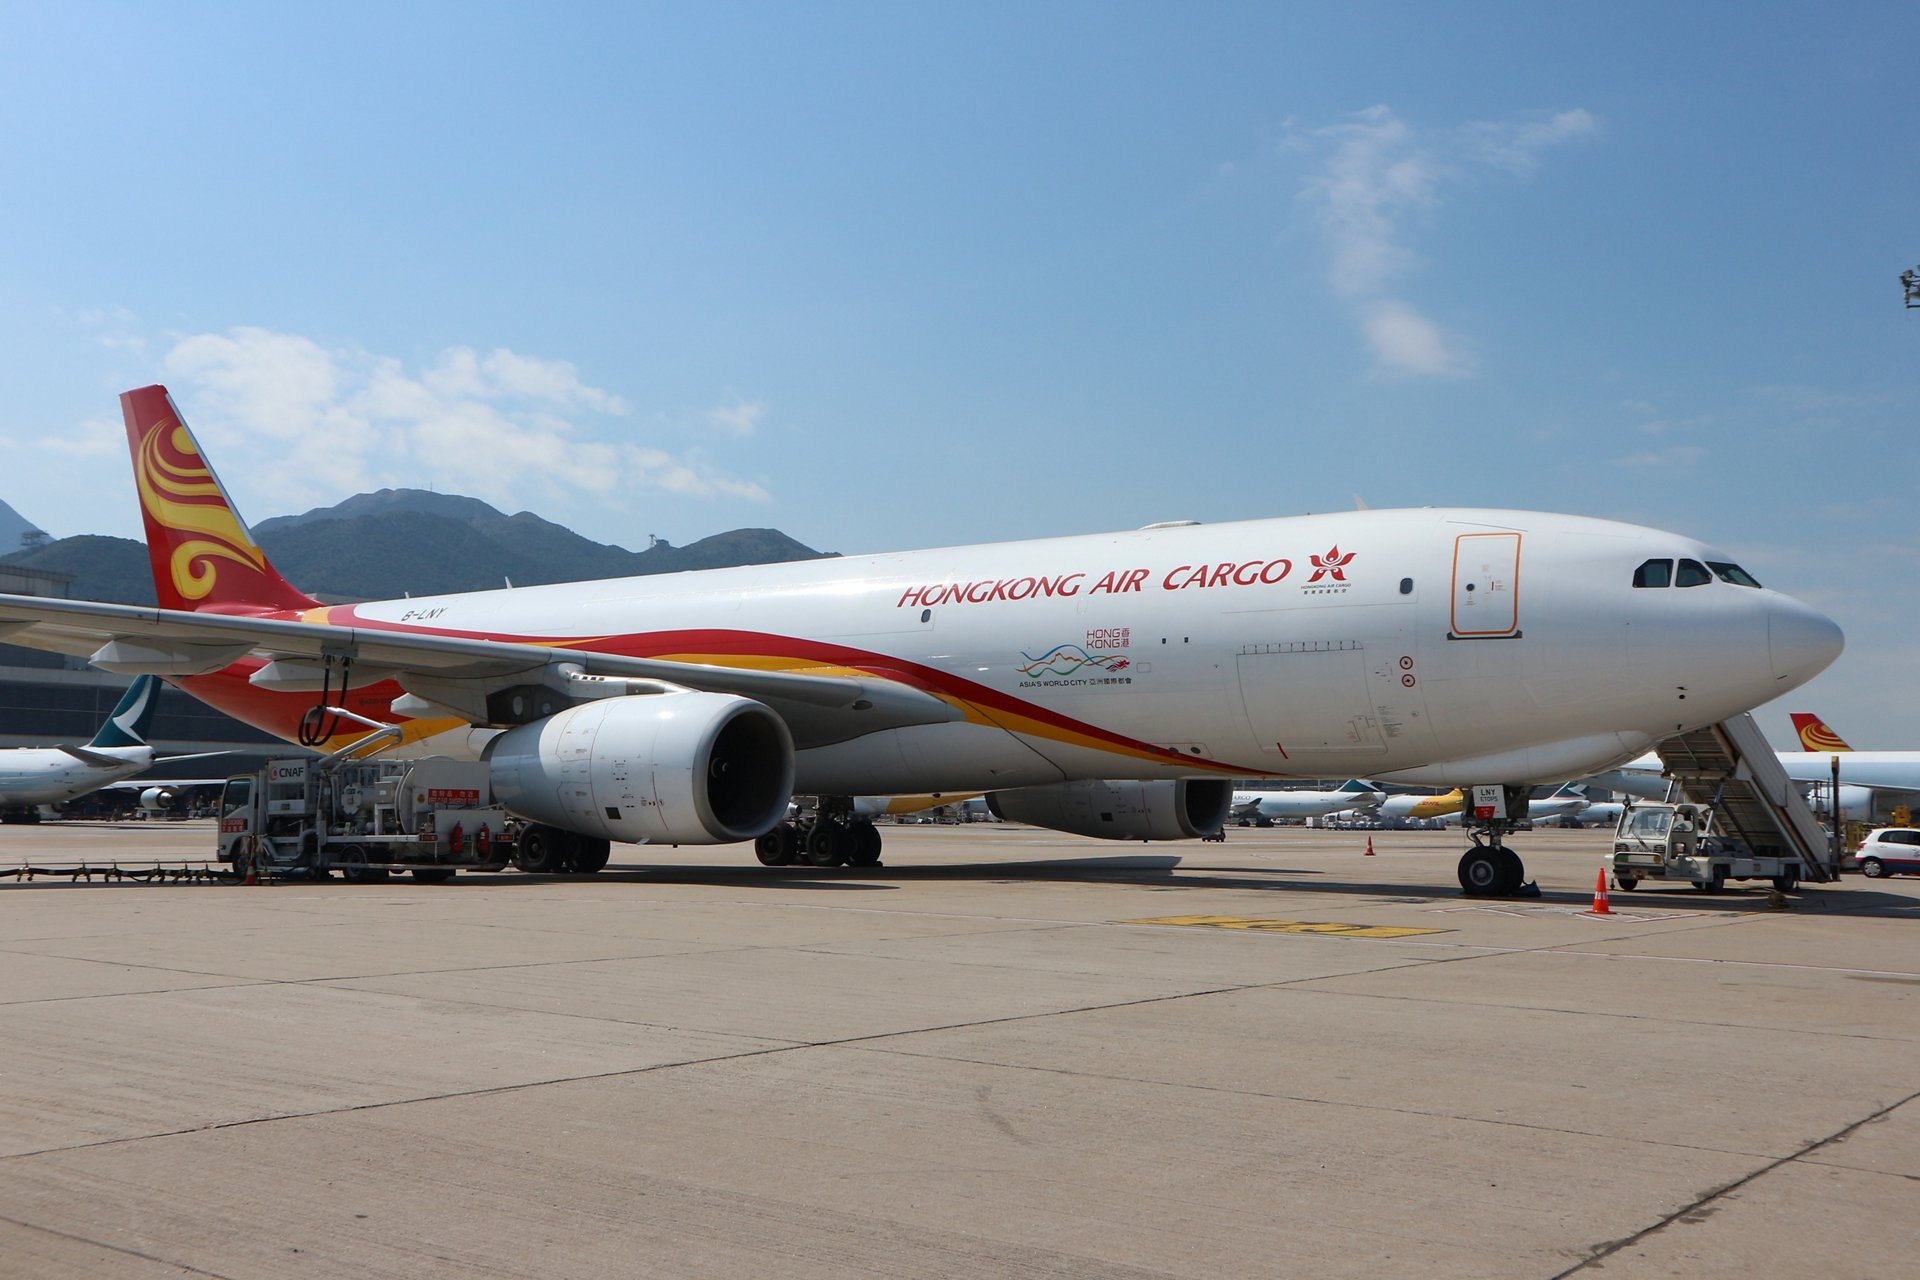 Hong Kong Air Cargo A330-232